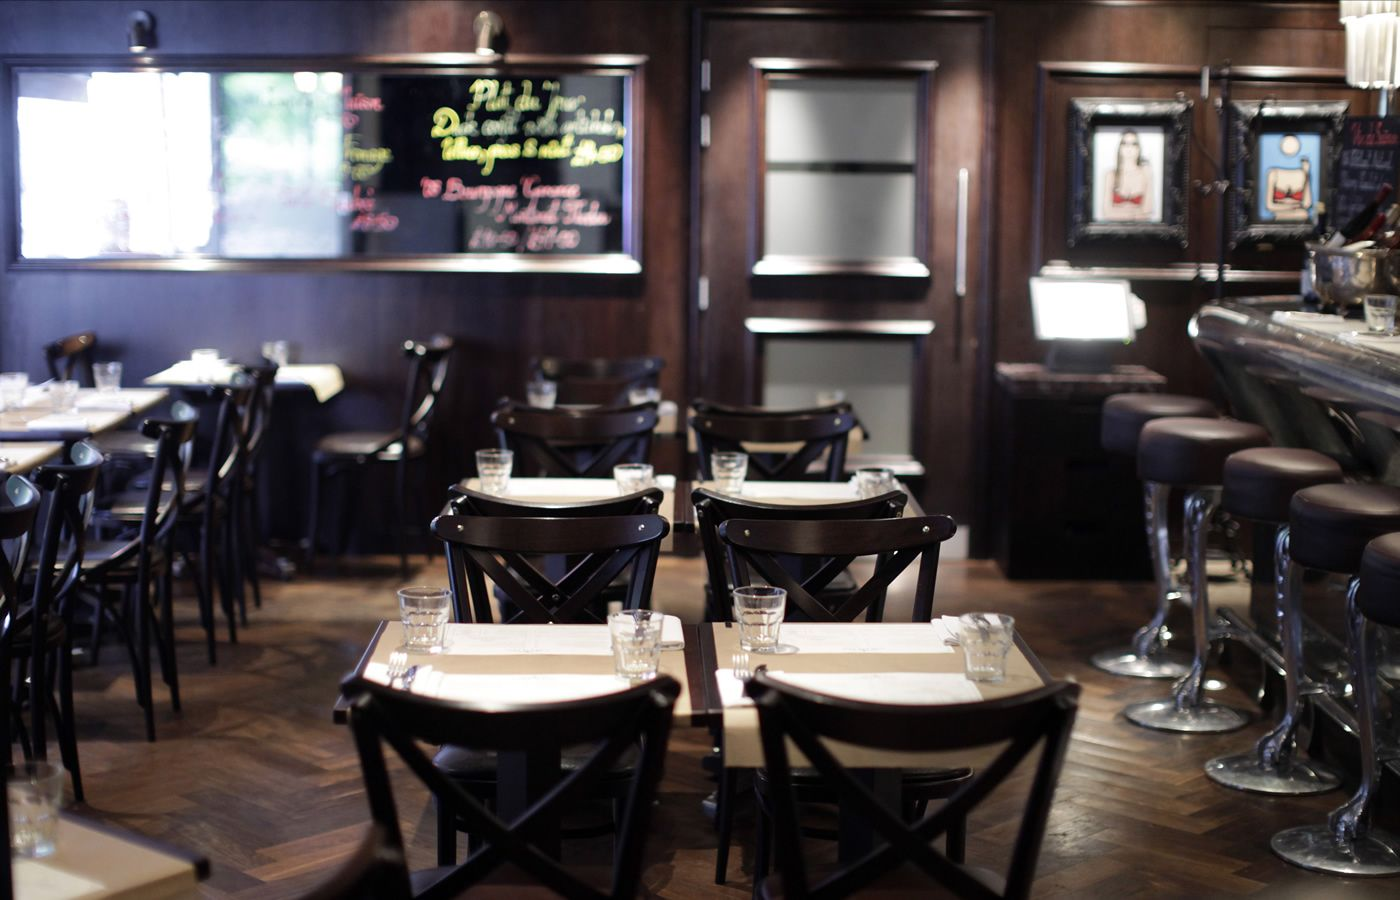 Café à Vin restaurant in Spital Square Spitalfields London